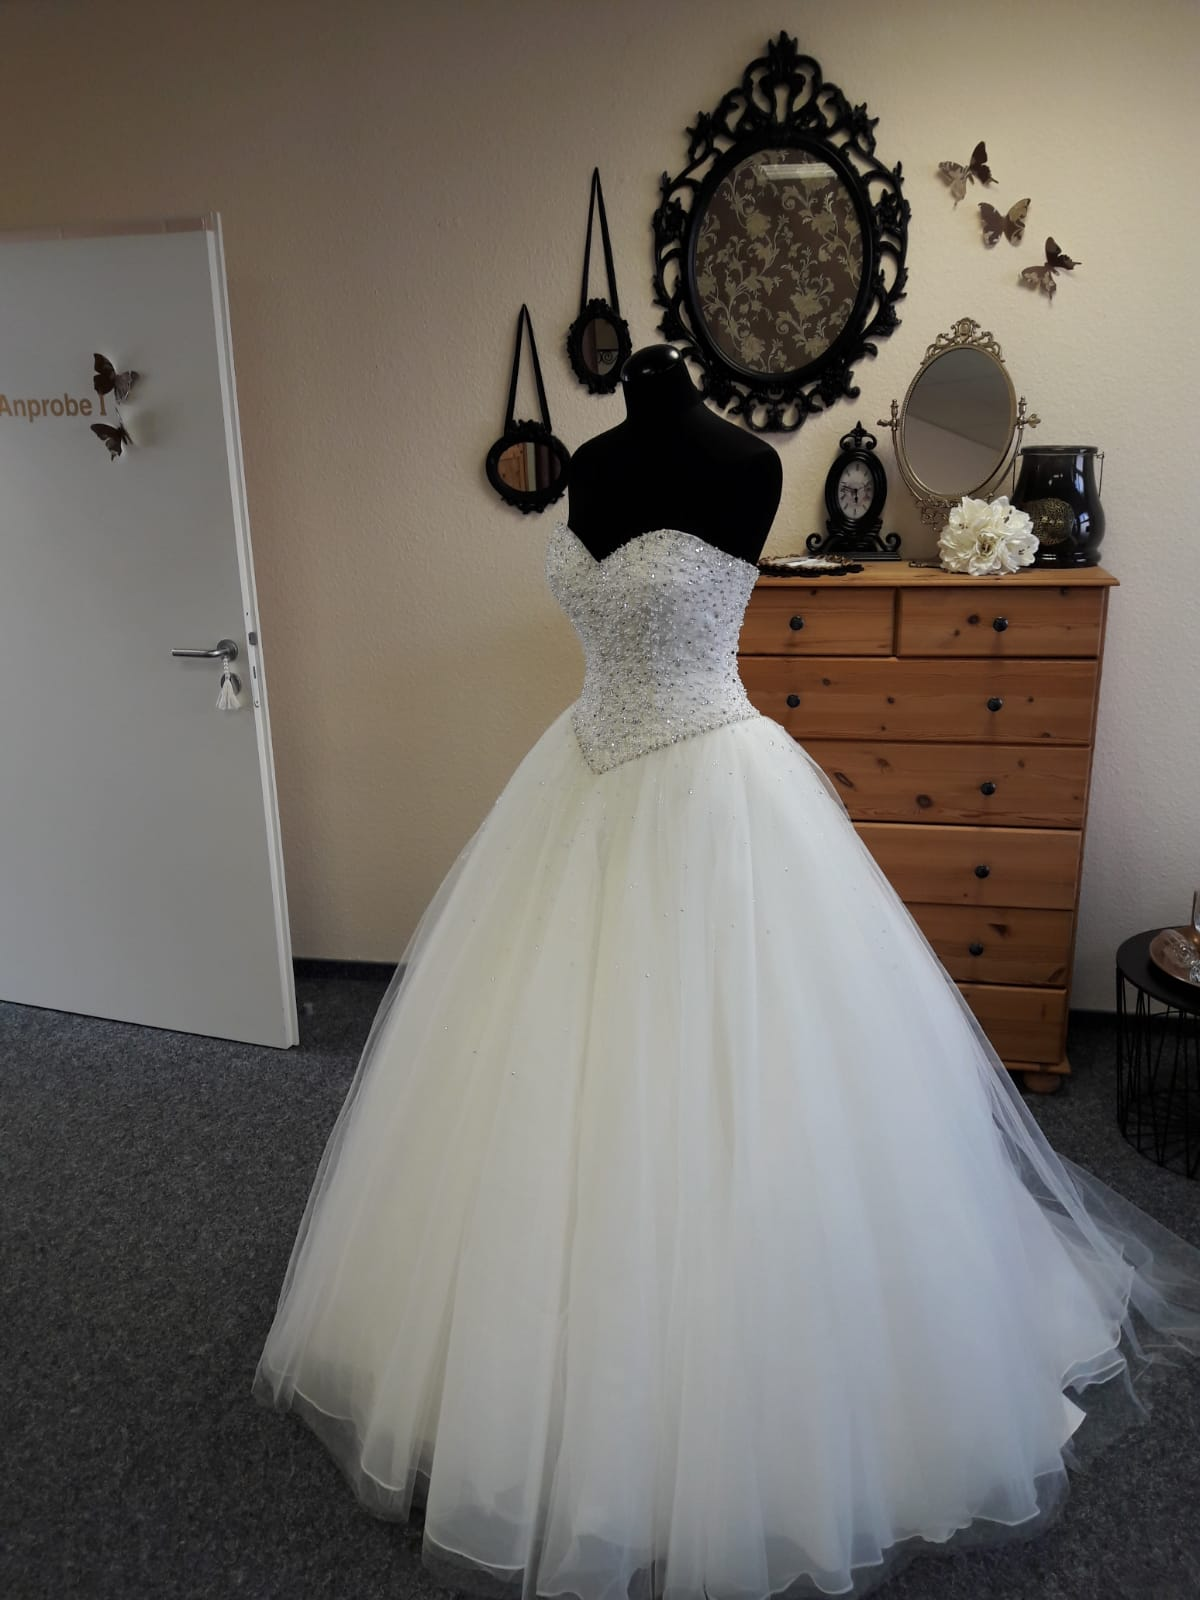 Klassik-Moderne-Glitzer-Brautkleid-17-17 - Brautparadies Jordan